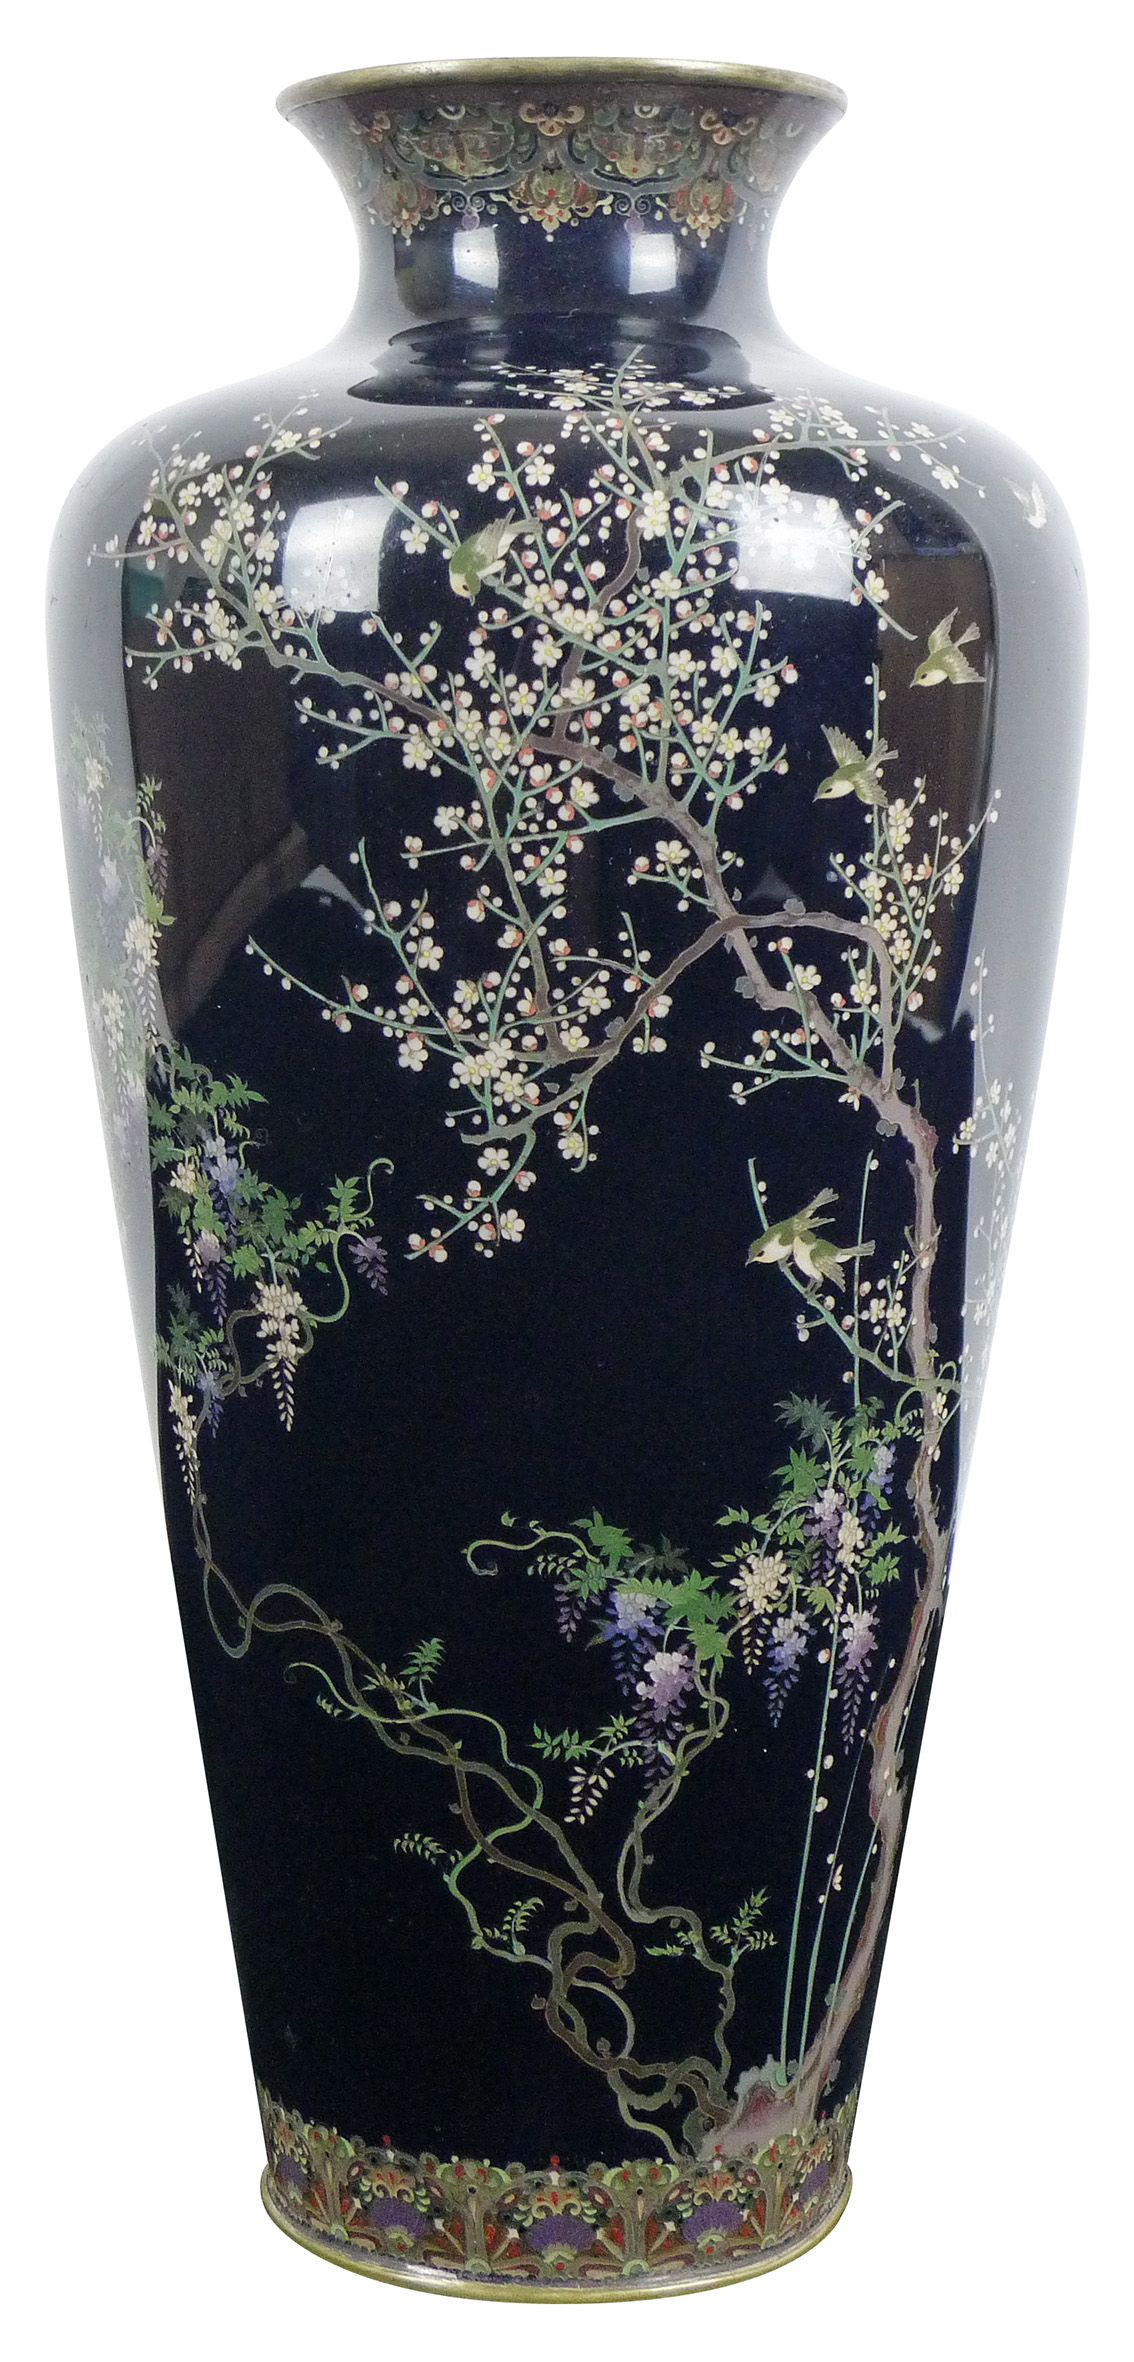 vintage japanese bronze vase of japanese cloisonne vases pics 13 od bronze cloisonne enamel ancient for japanese cloisonne vases collection japanese cloisonne vase silver wires decorated all round with of japanese cloisonne